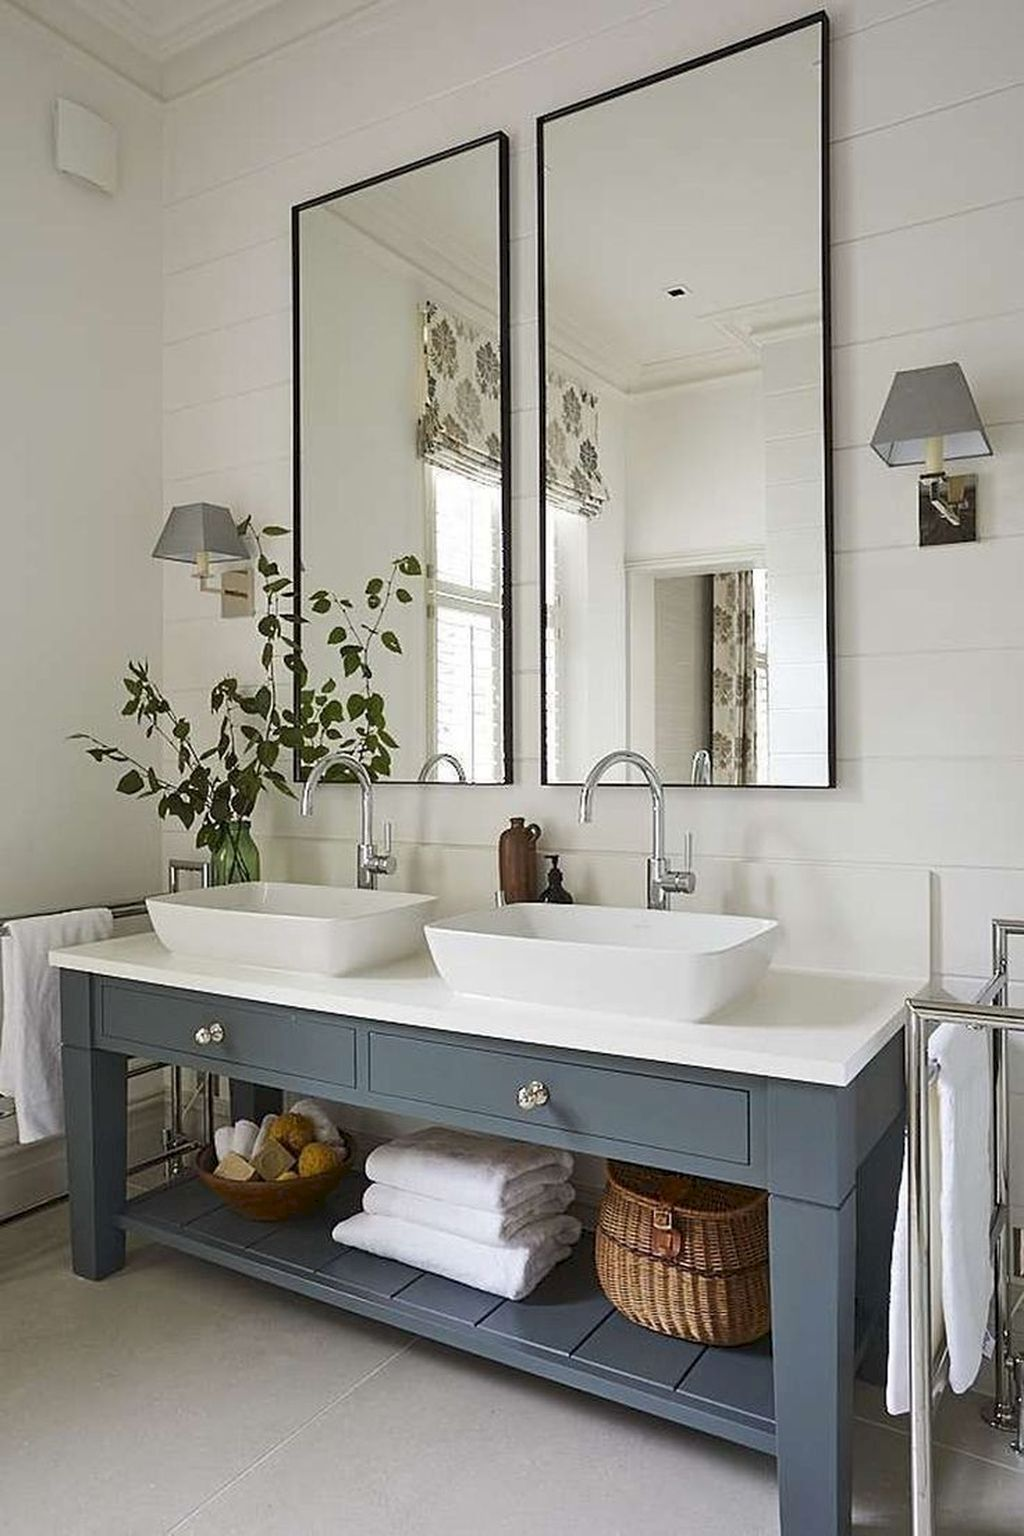 45 Stunning Farmhouse Bathroom Vanity Decorating Ideas